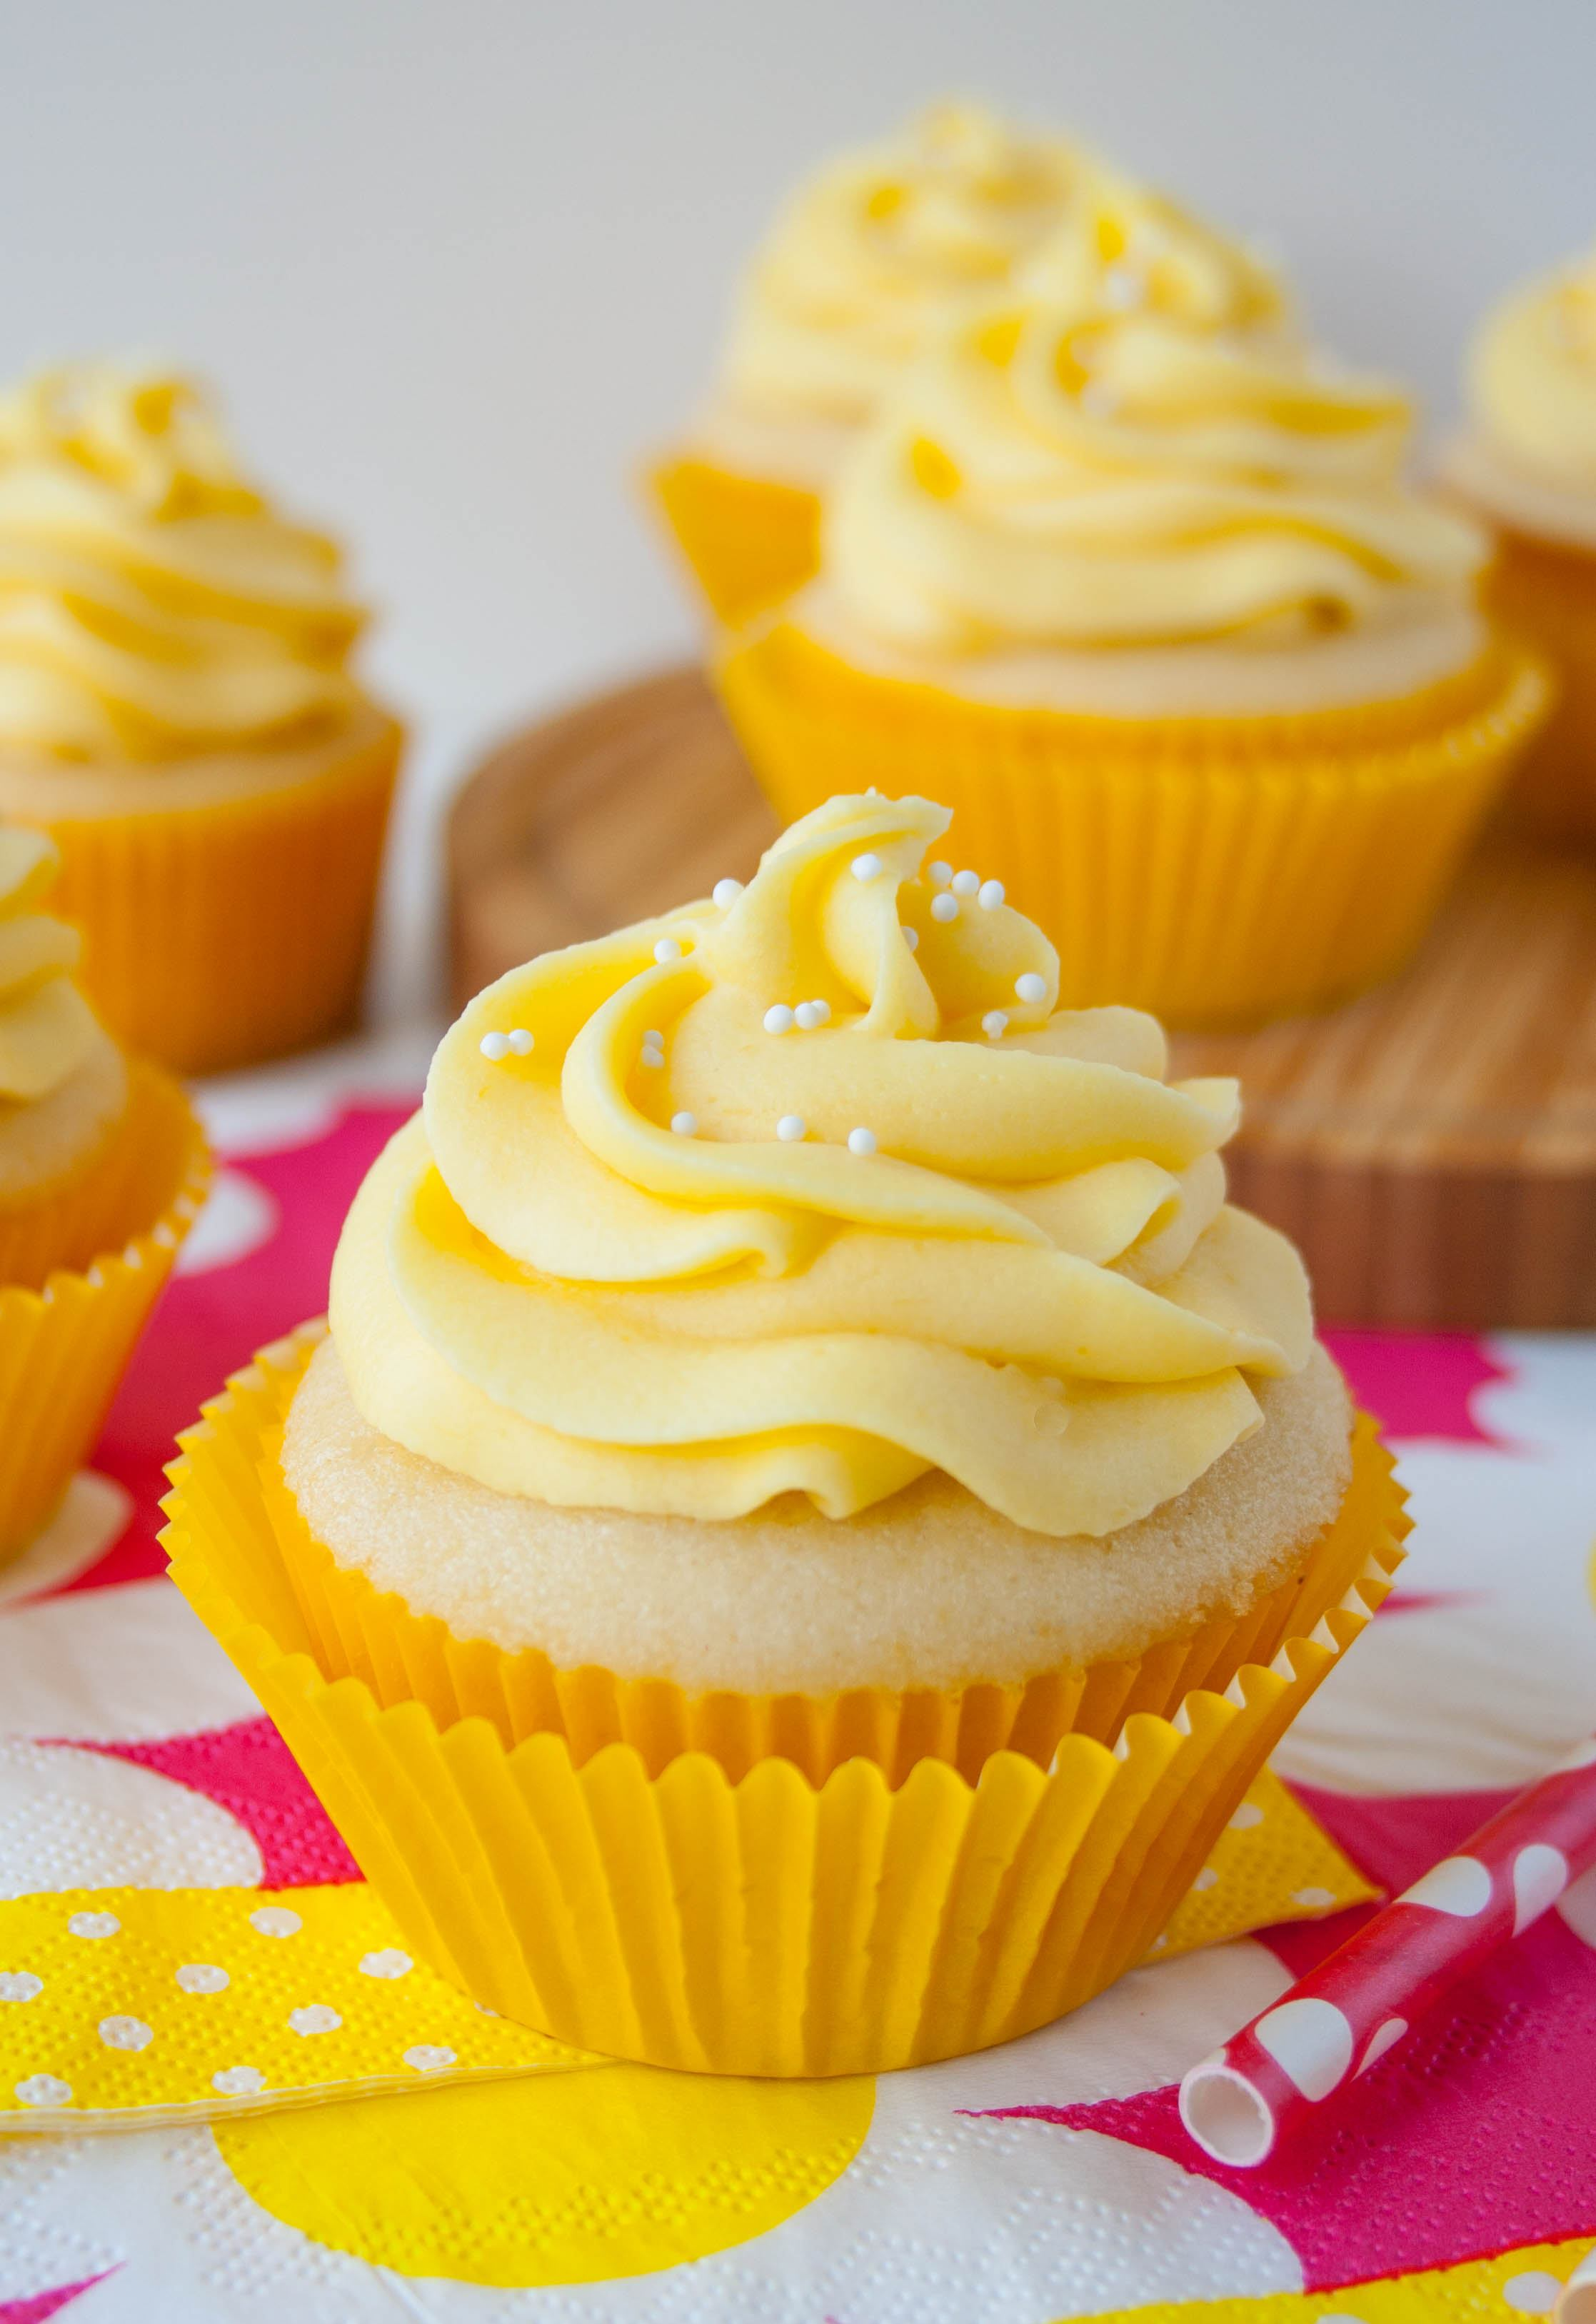 tropical-mango-vanilla-cupcakes-2.jpg